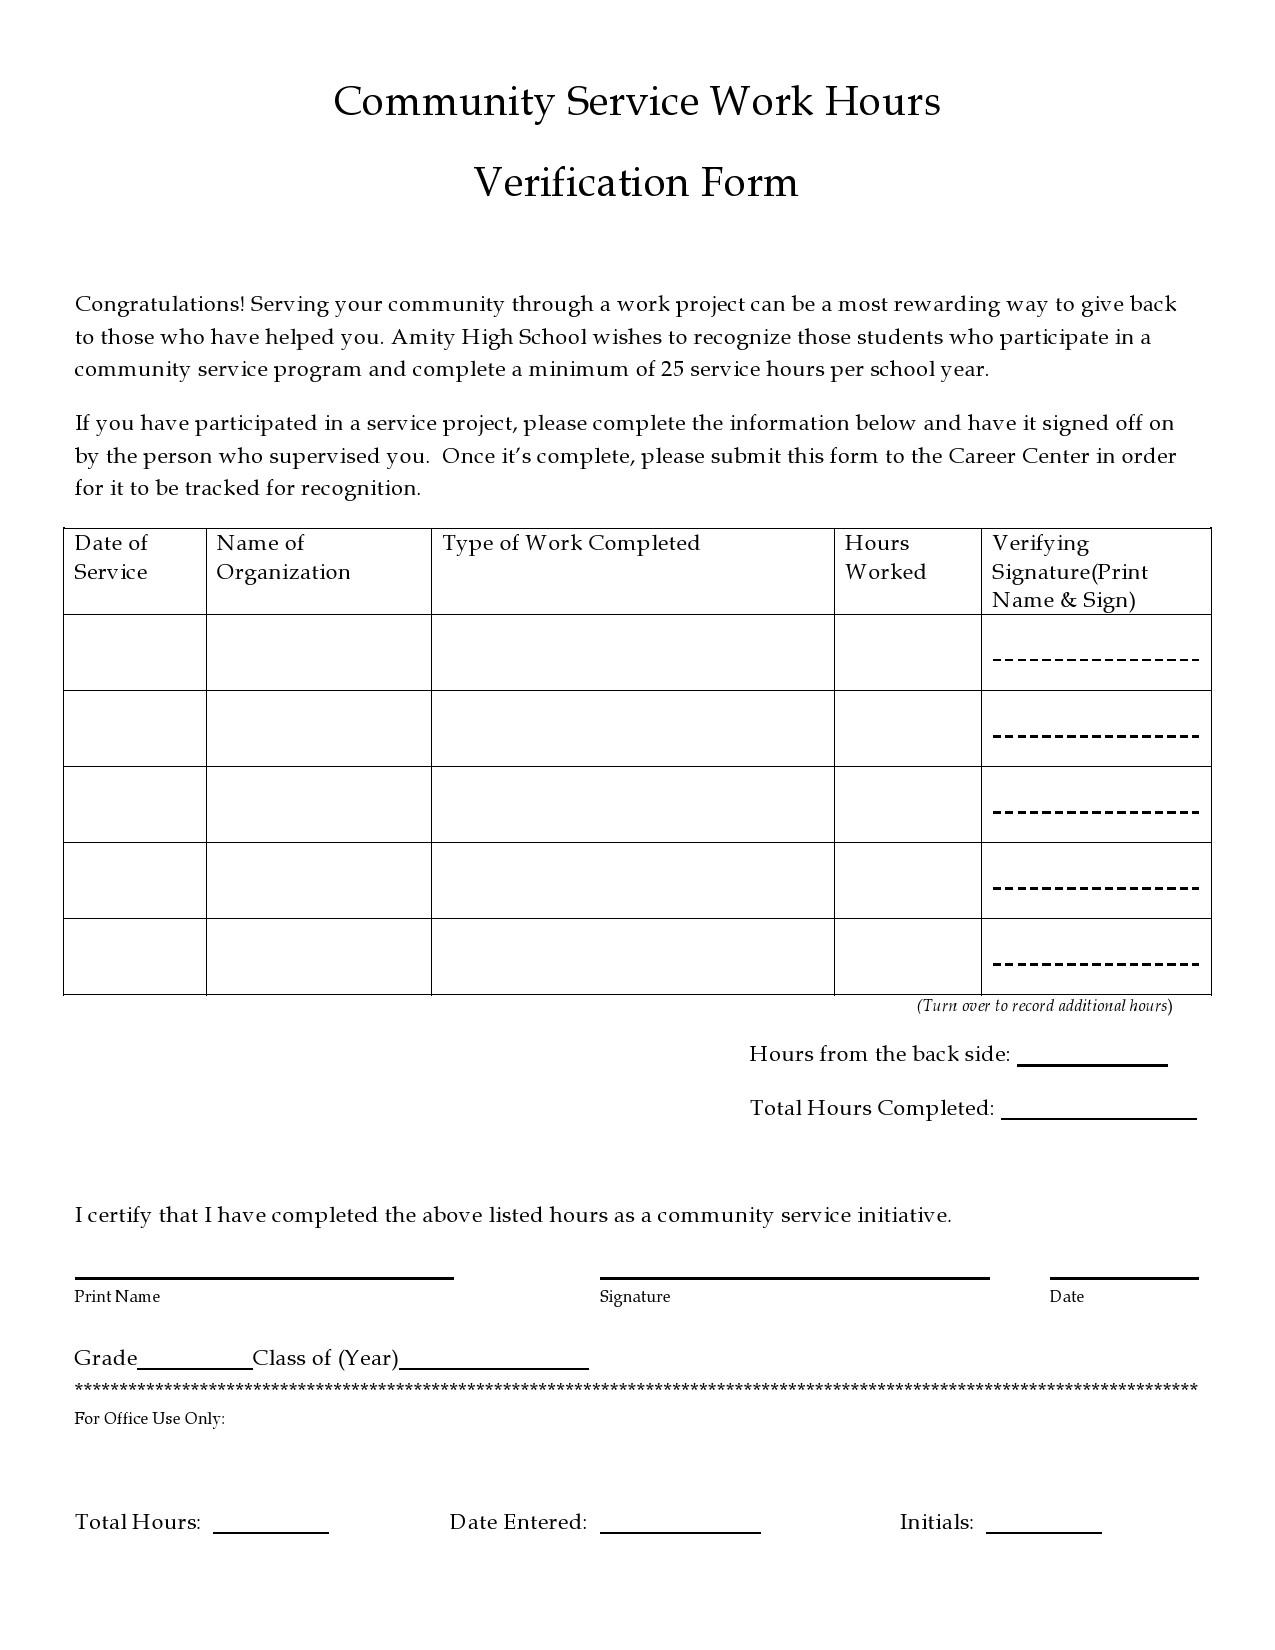 44 Printable Community Service Forms Ms Word ᐅ Templatelab